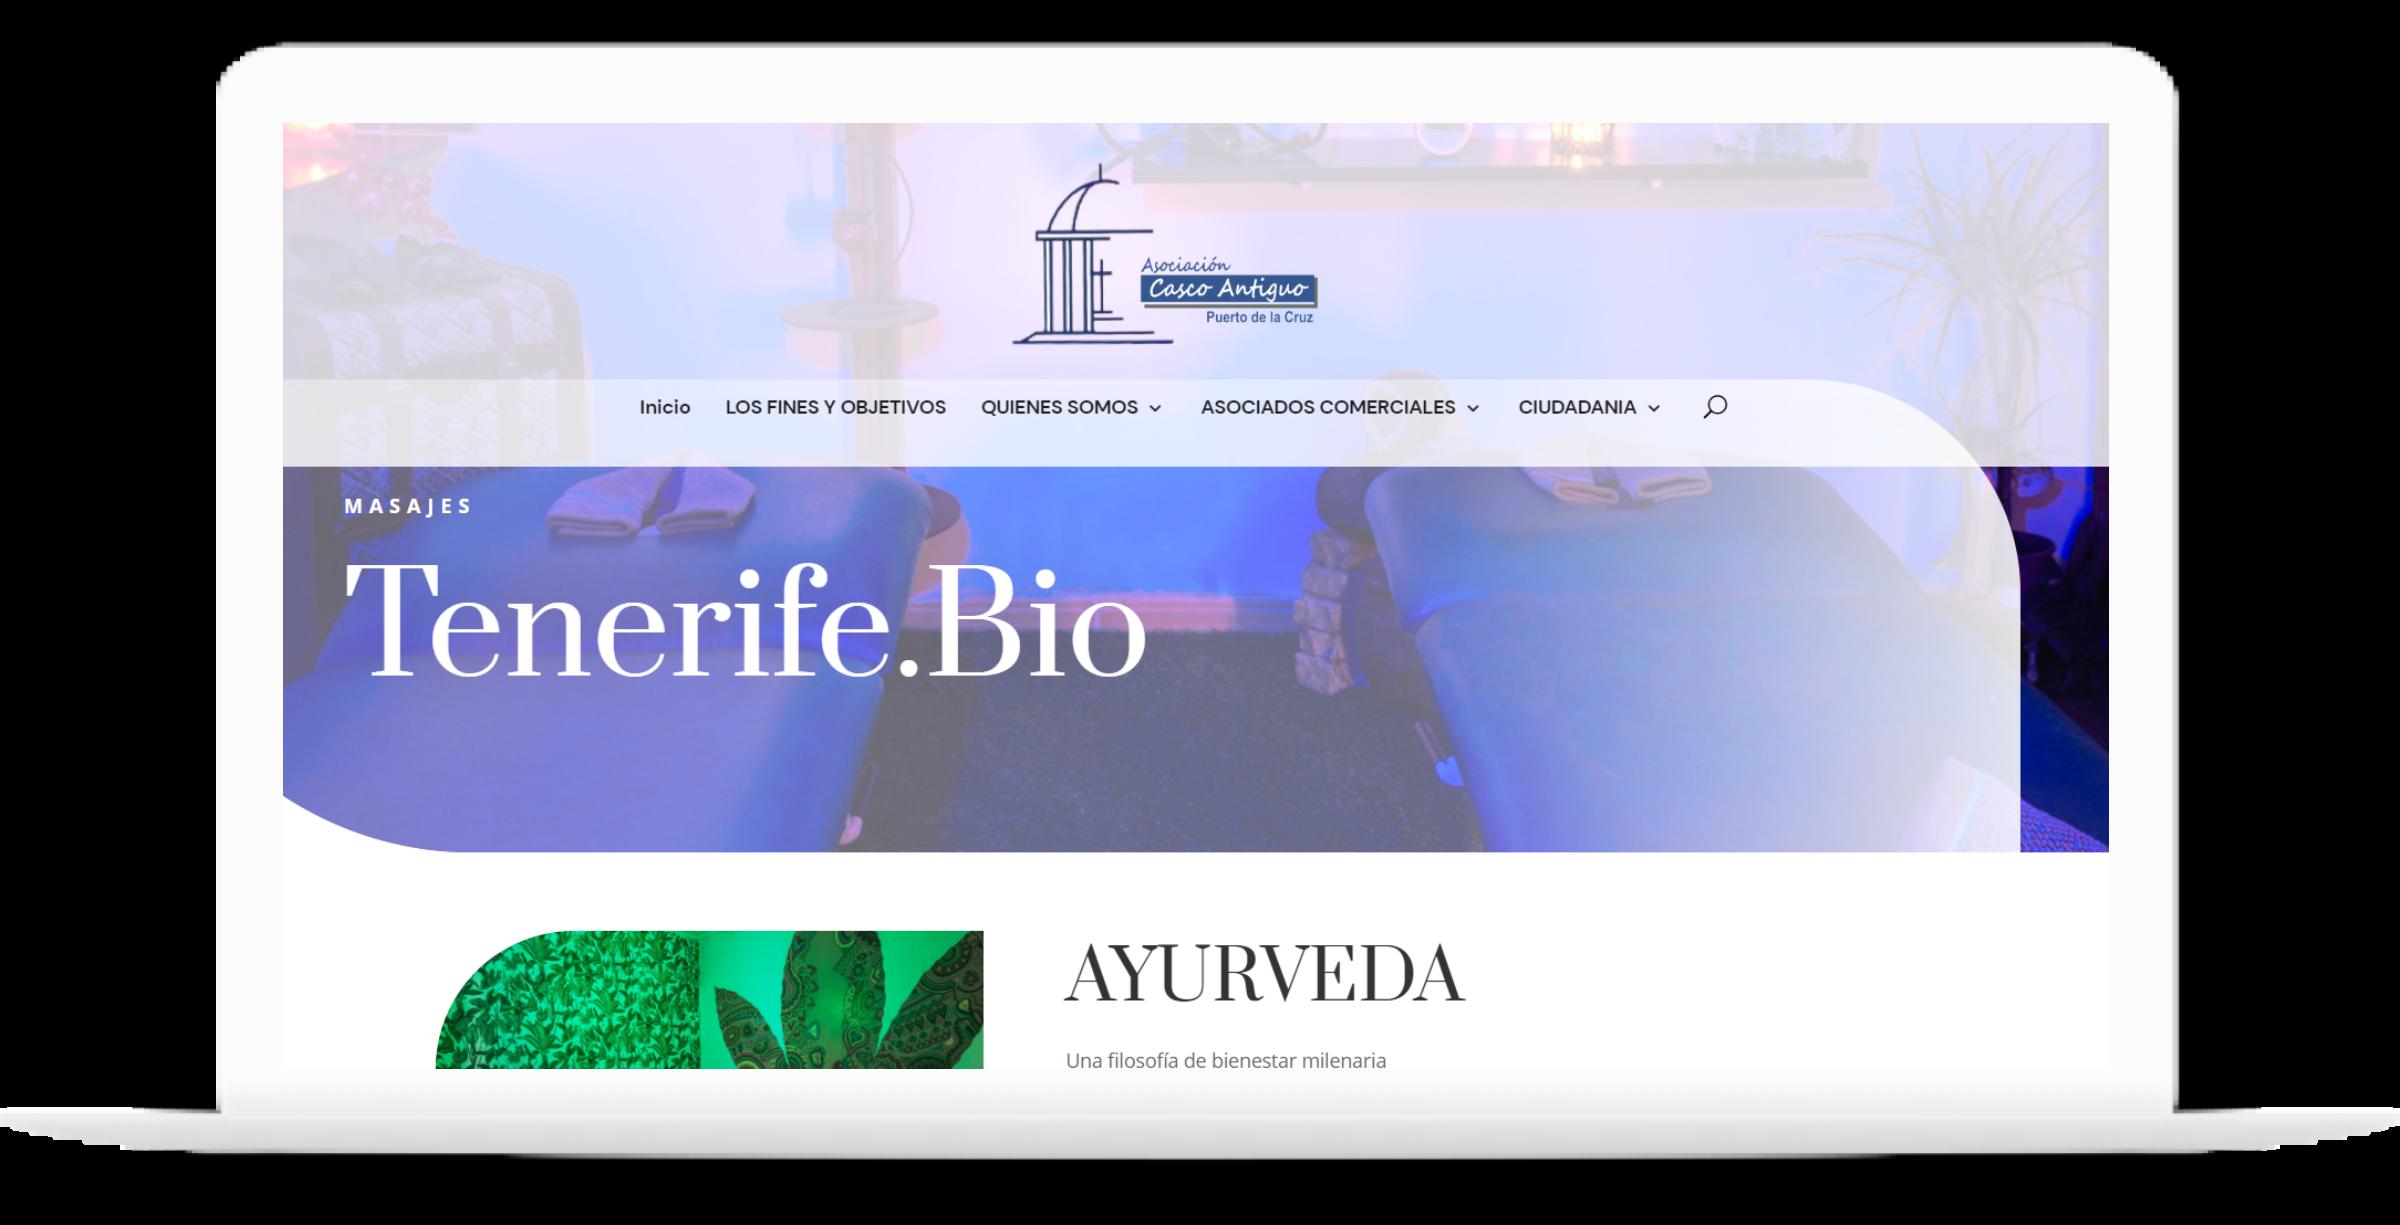 Tenerife.bio